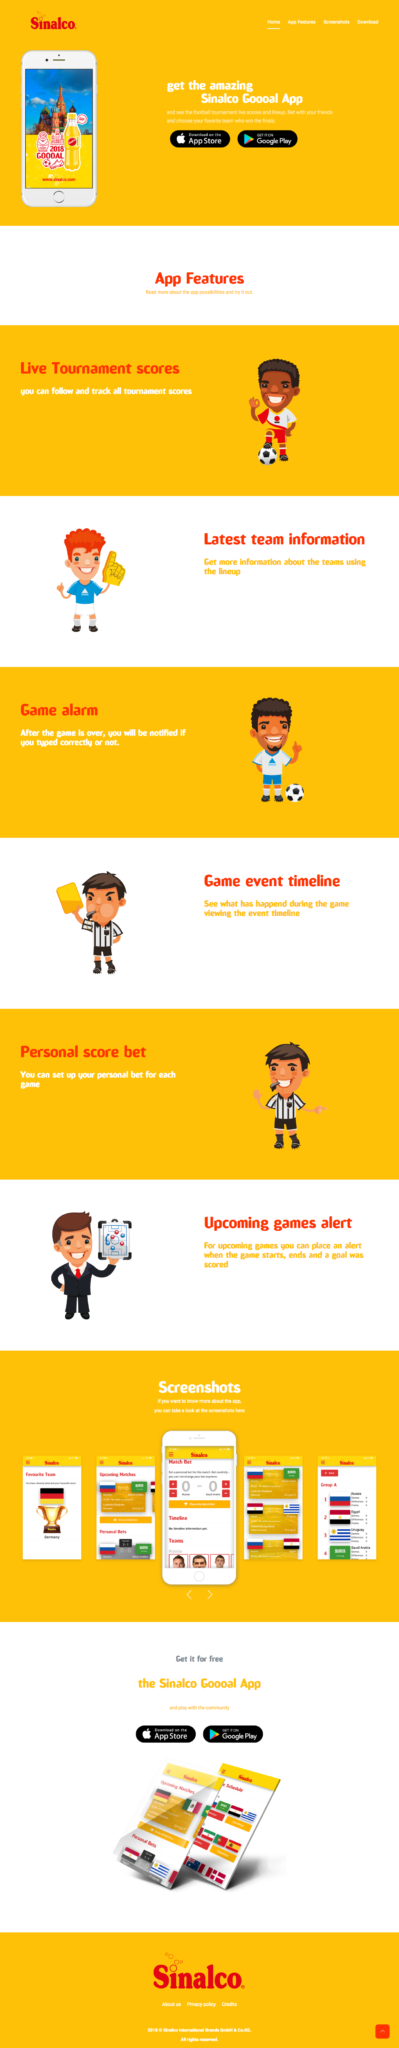 page-1 Sinalco Goooal App zur Fussball Weltmeisterschaft